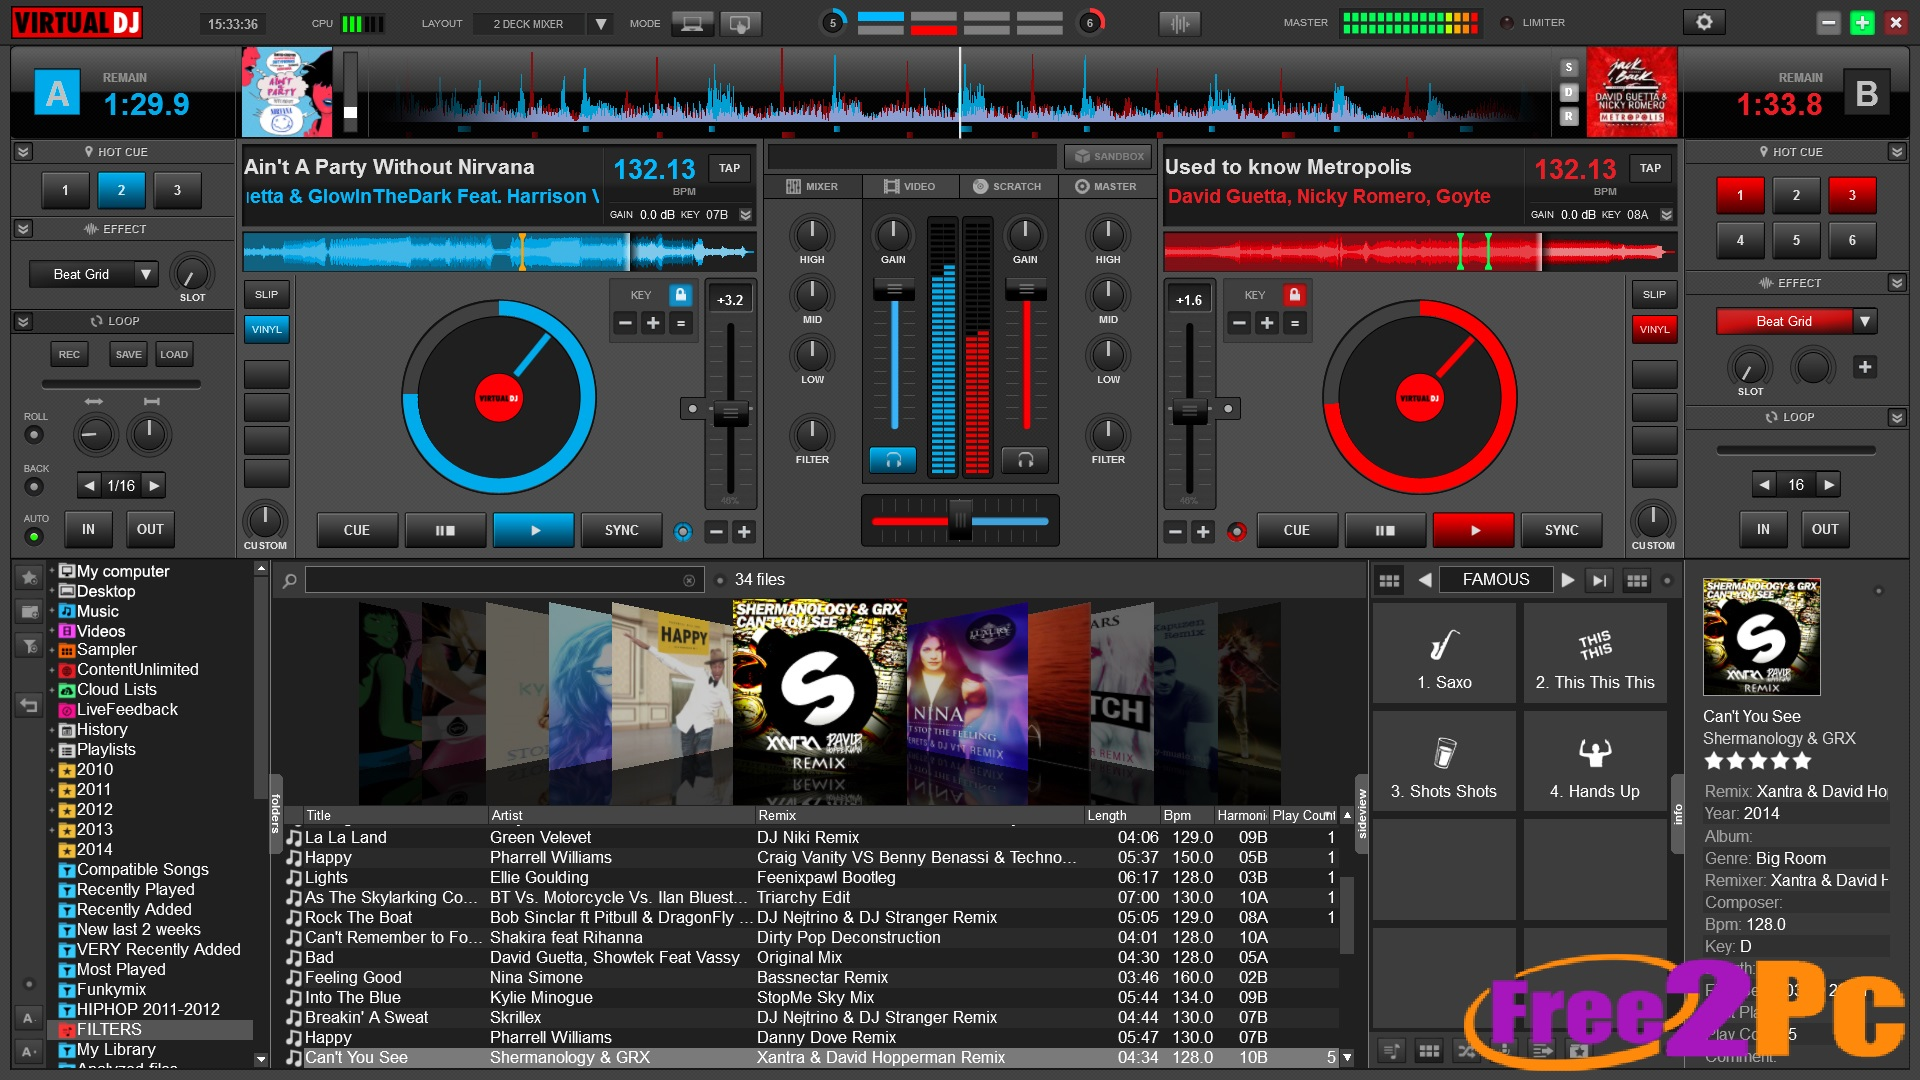 virtual dj 8 crack download for pc